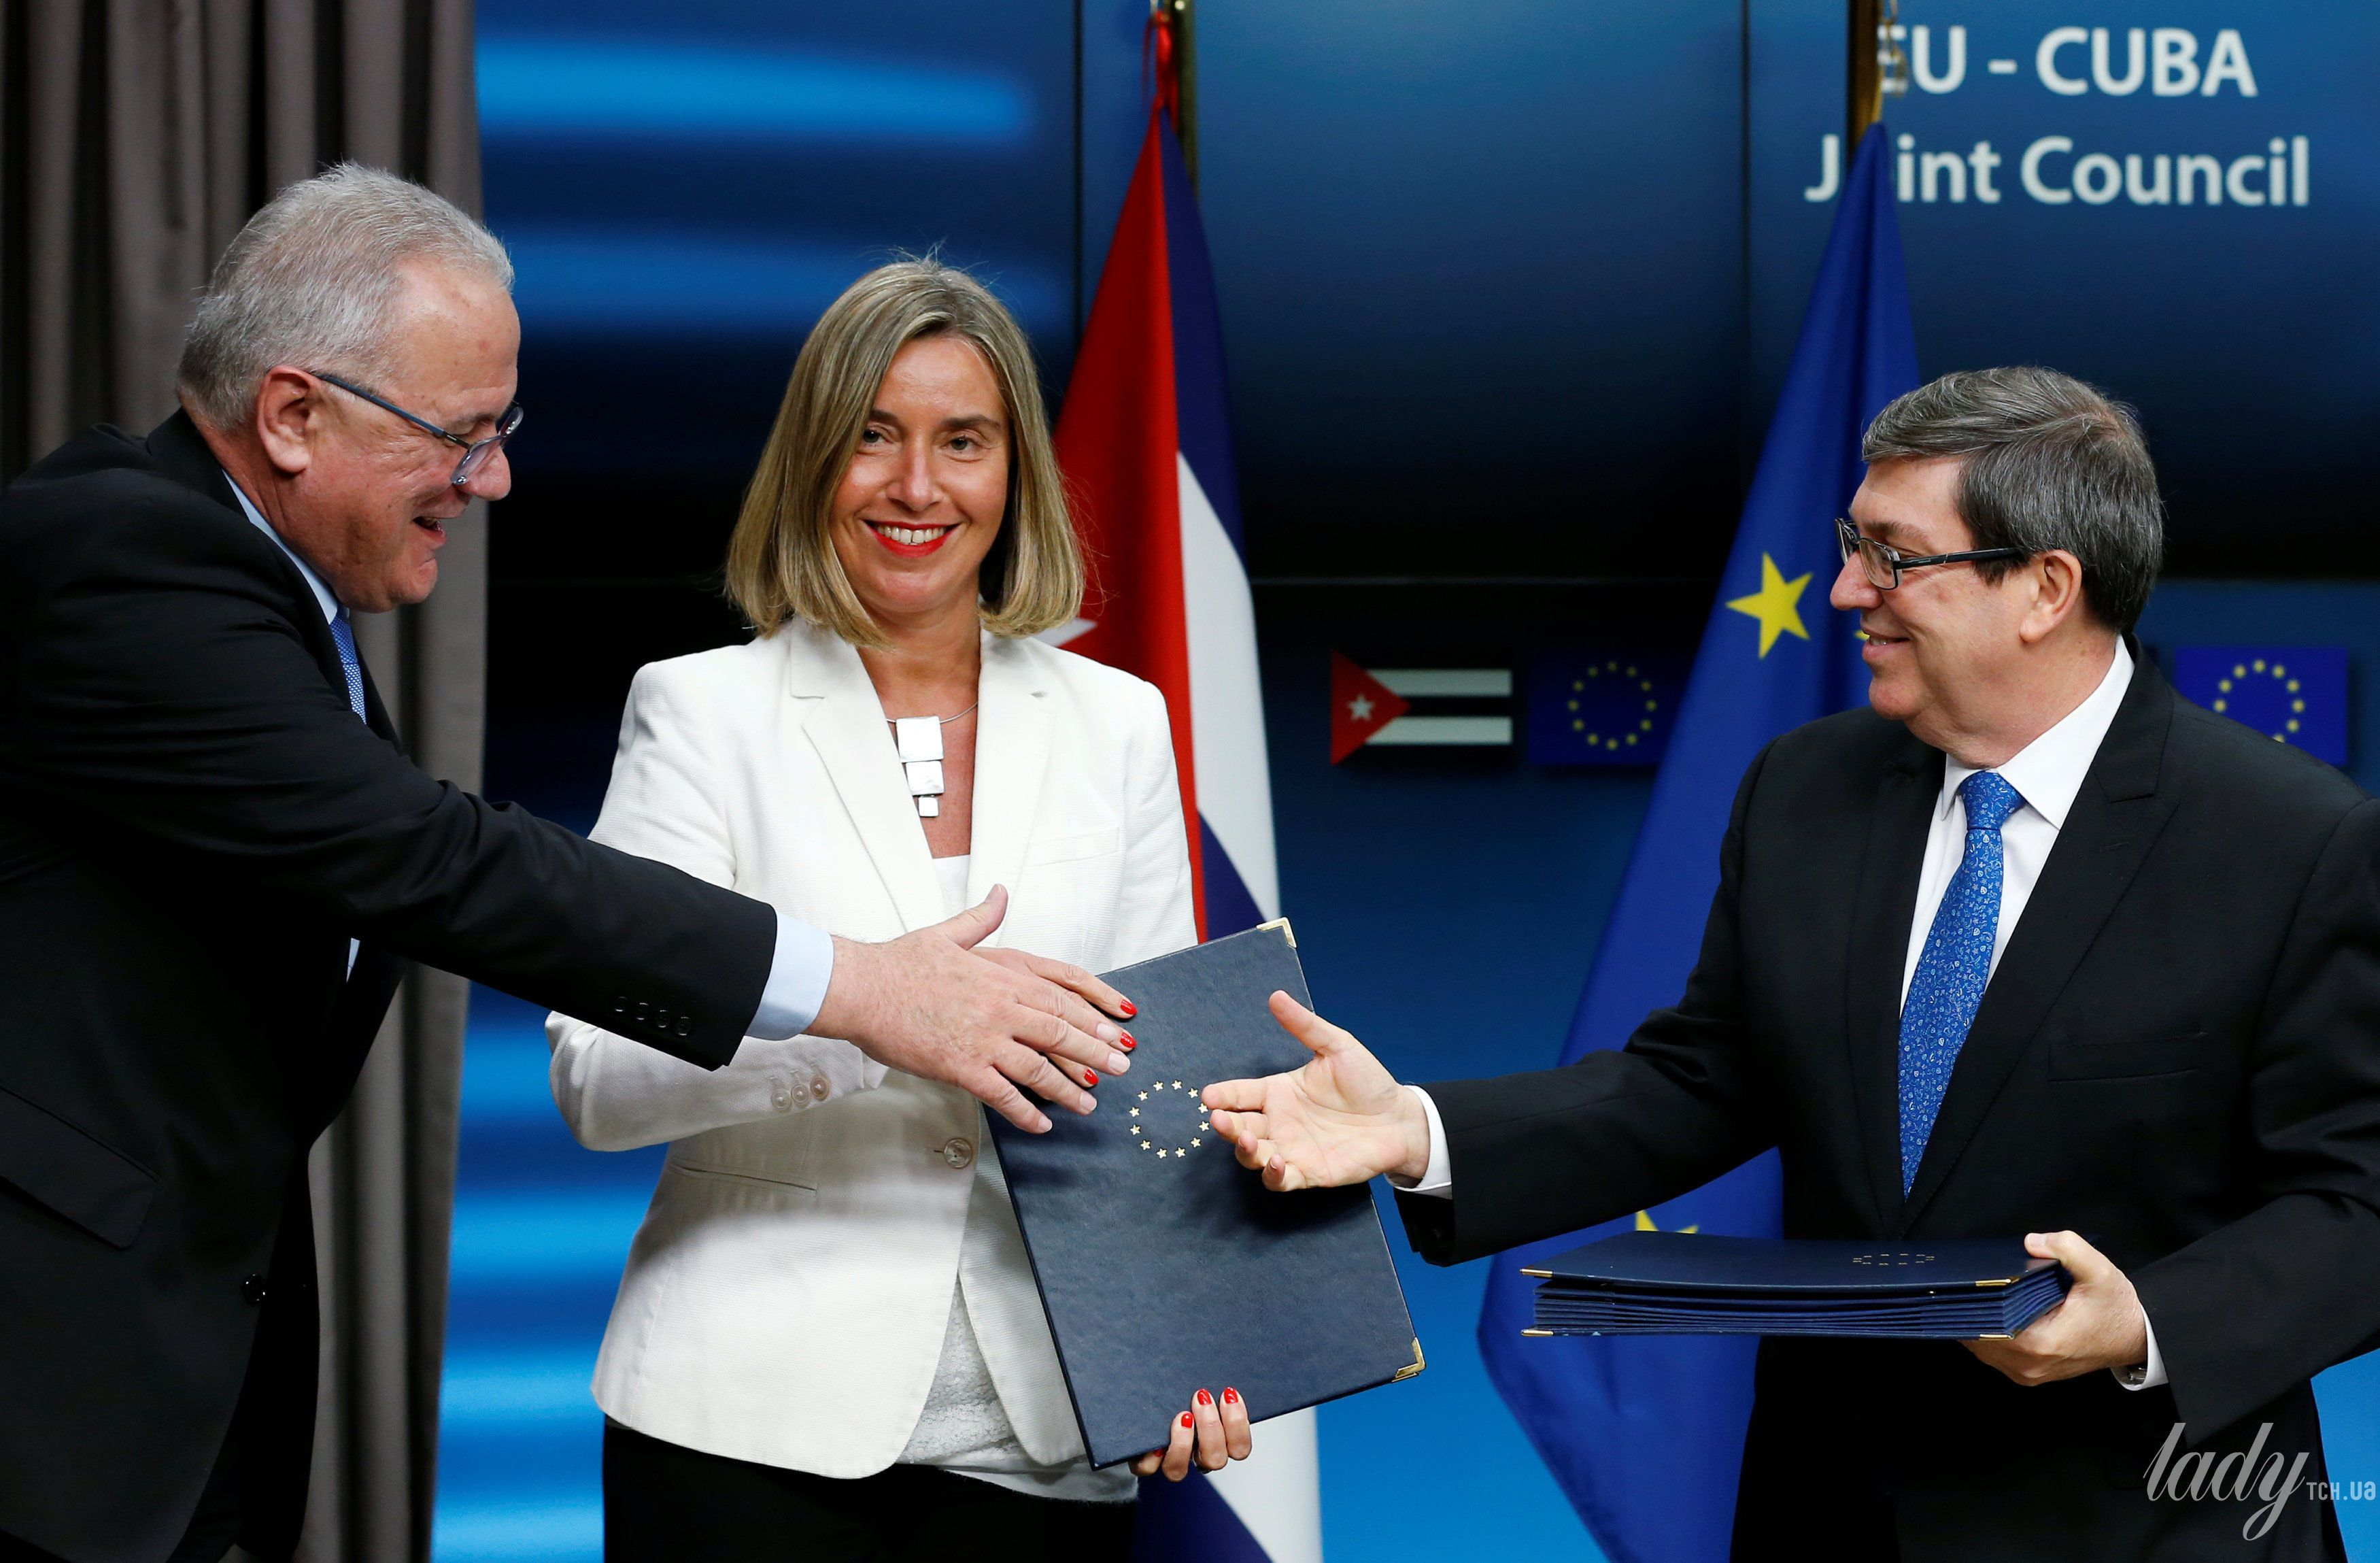 Глава дипломатии ЕС Федерика Могерини_2